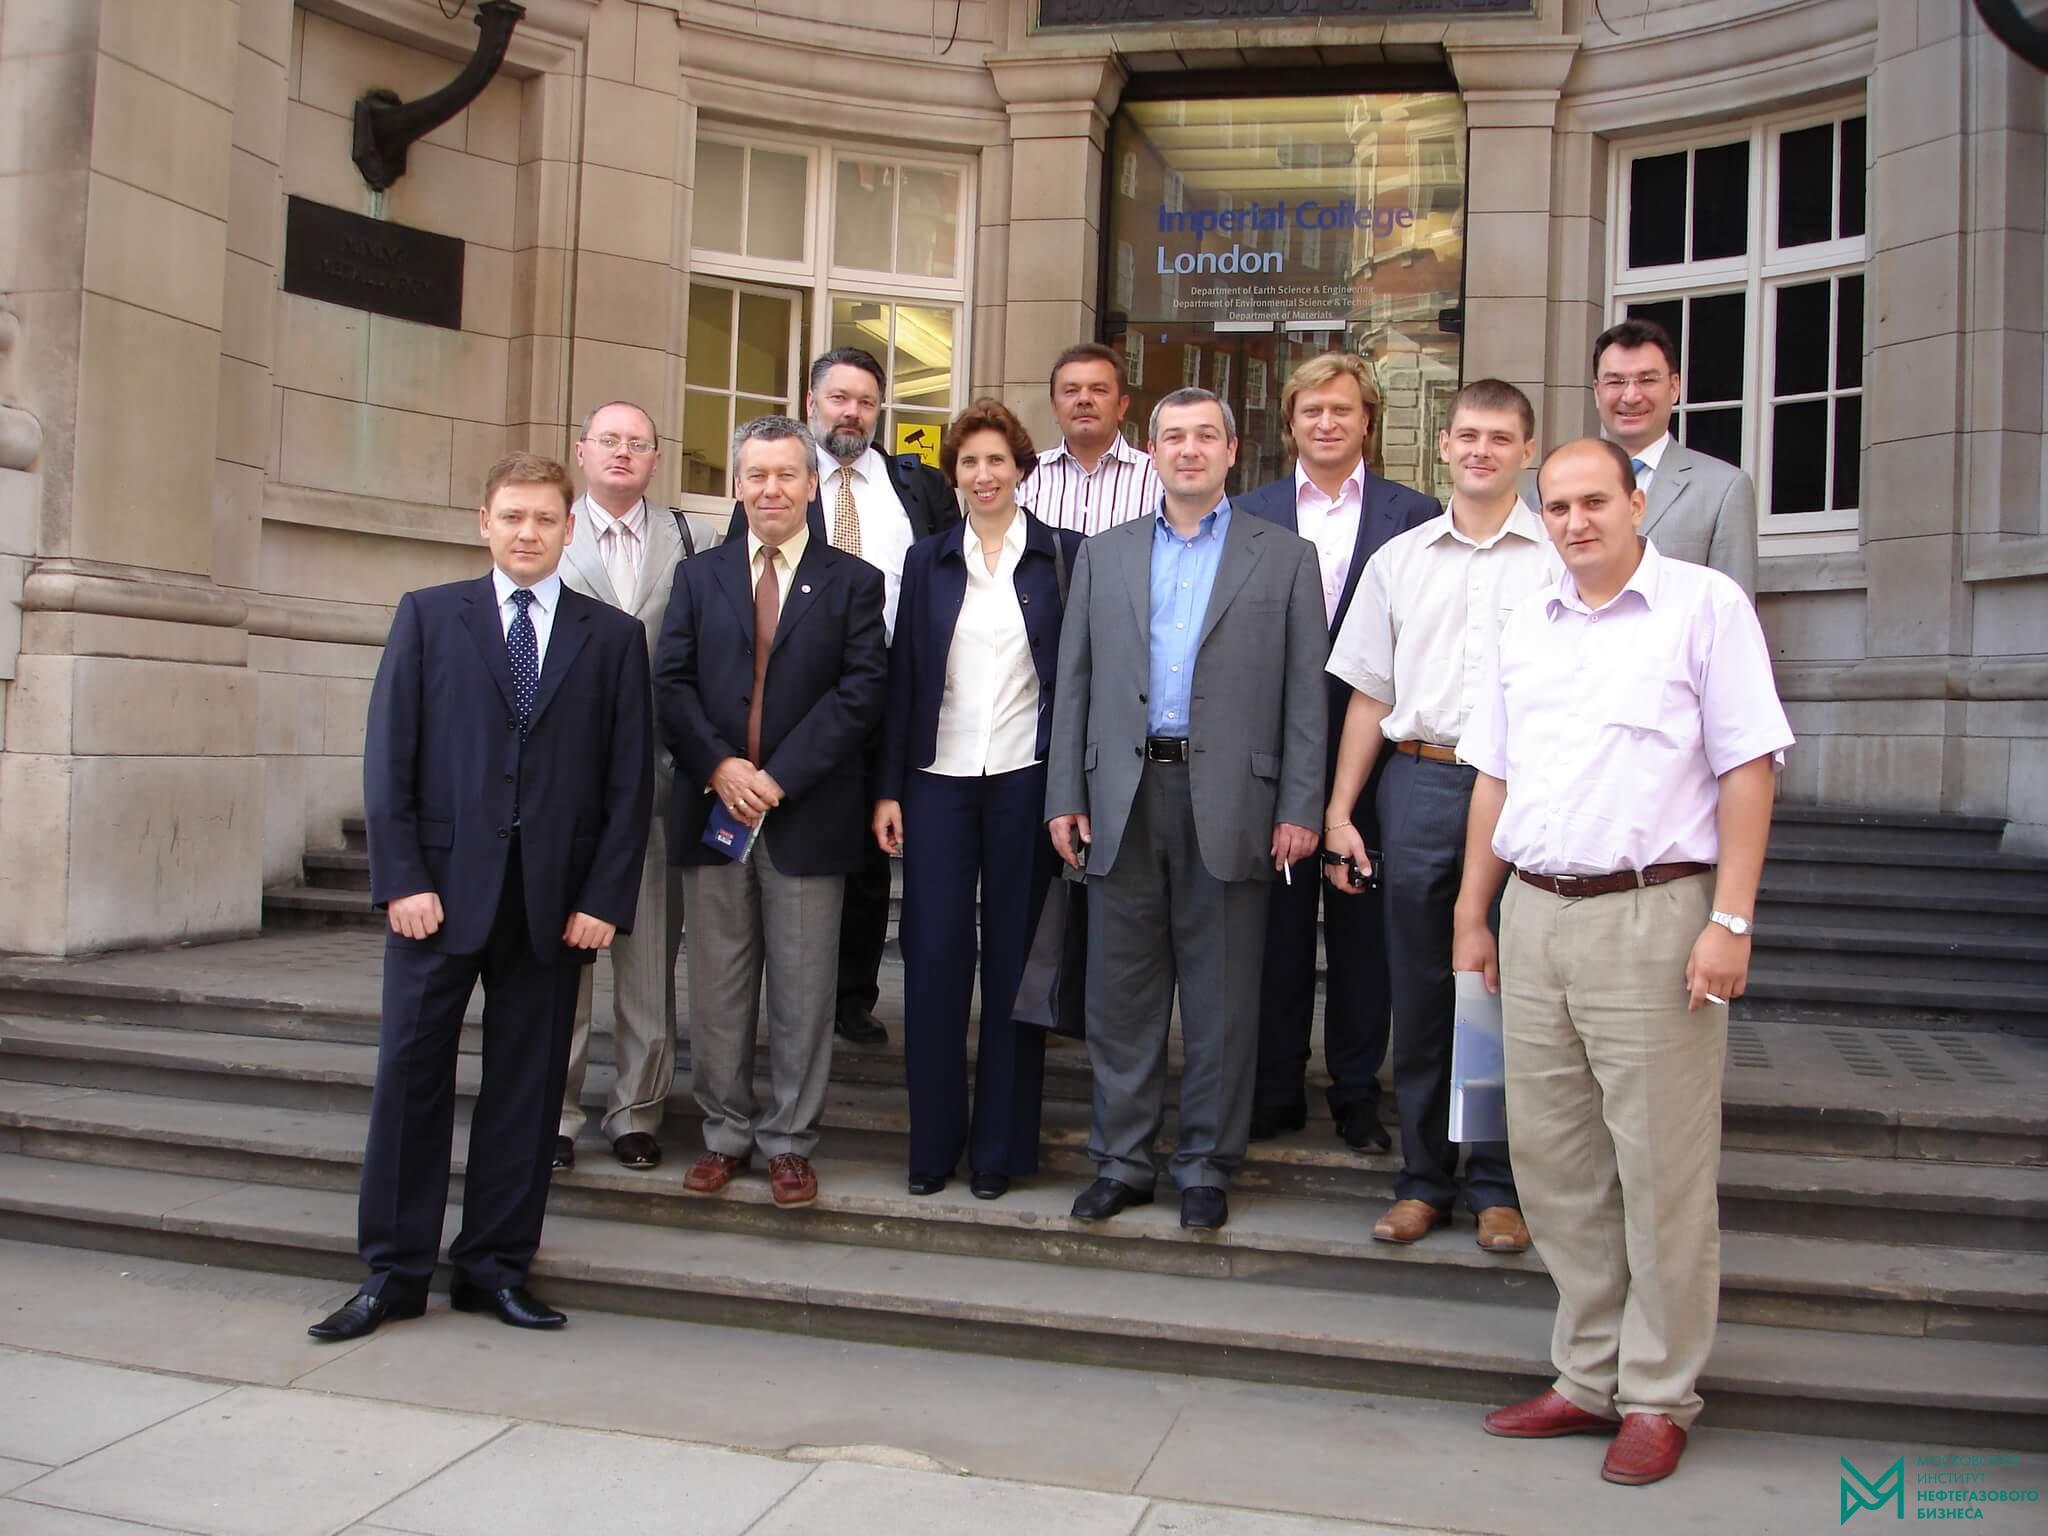 Стажировка Executive MBA: Нефтегазовый бизнес в Великобритании, Imperial College